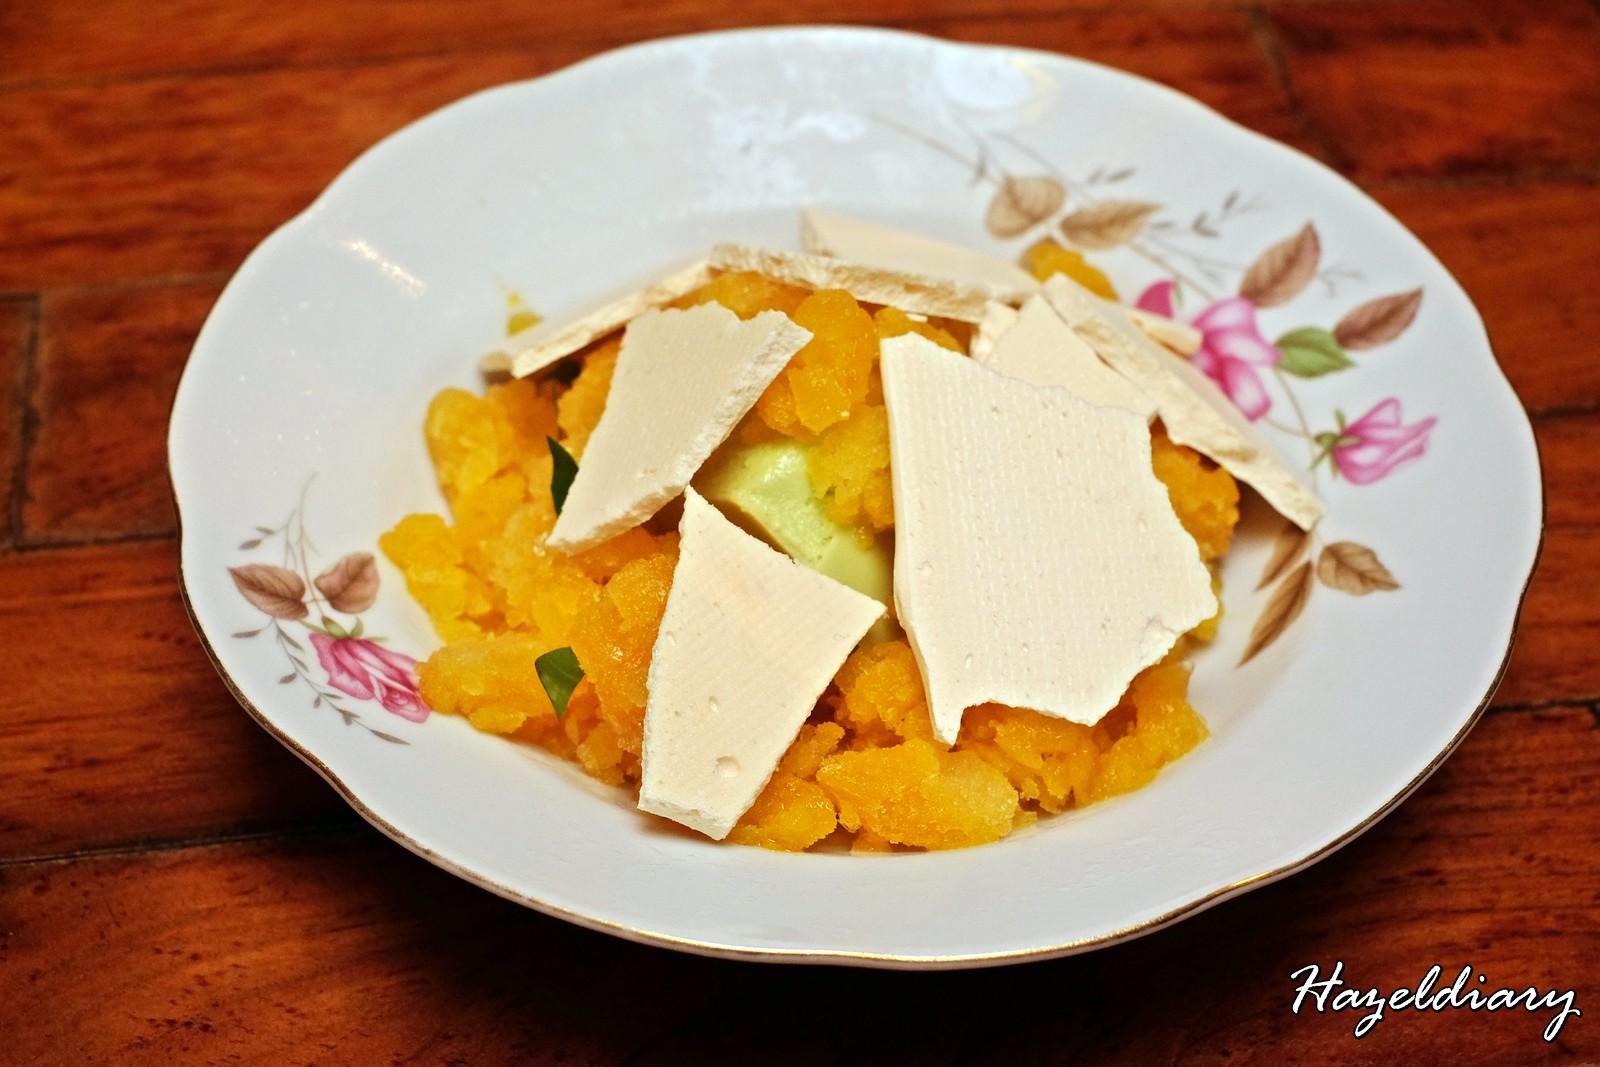 Artichoke by Chef Bjorn Shen-Malabi